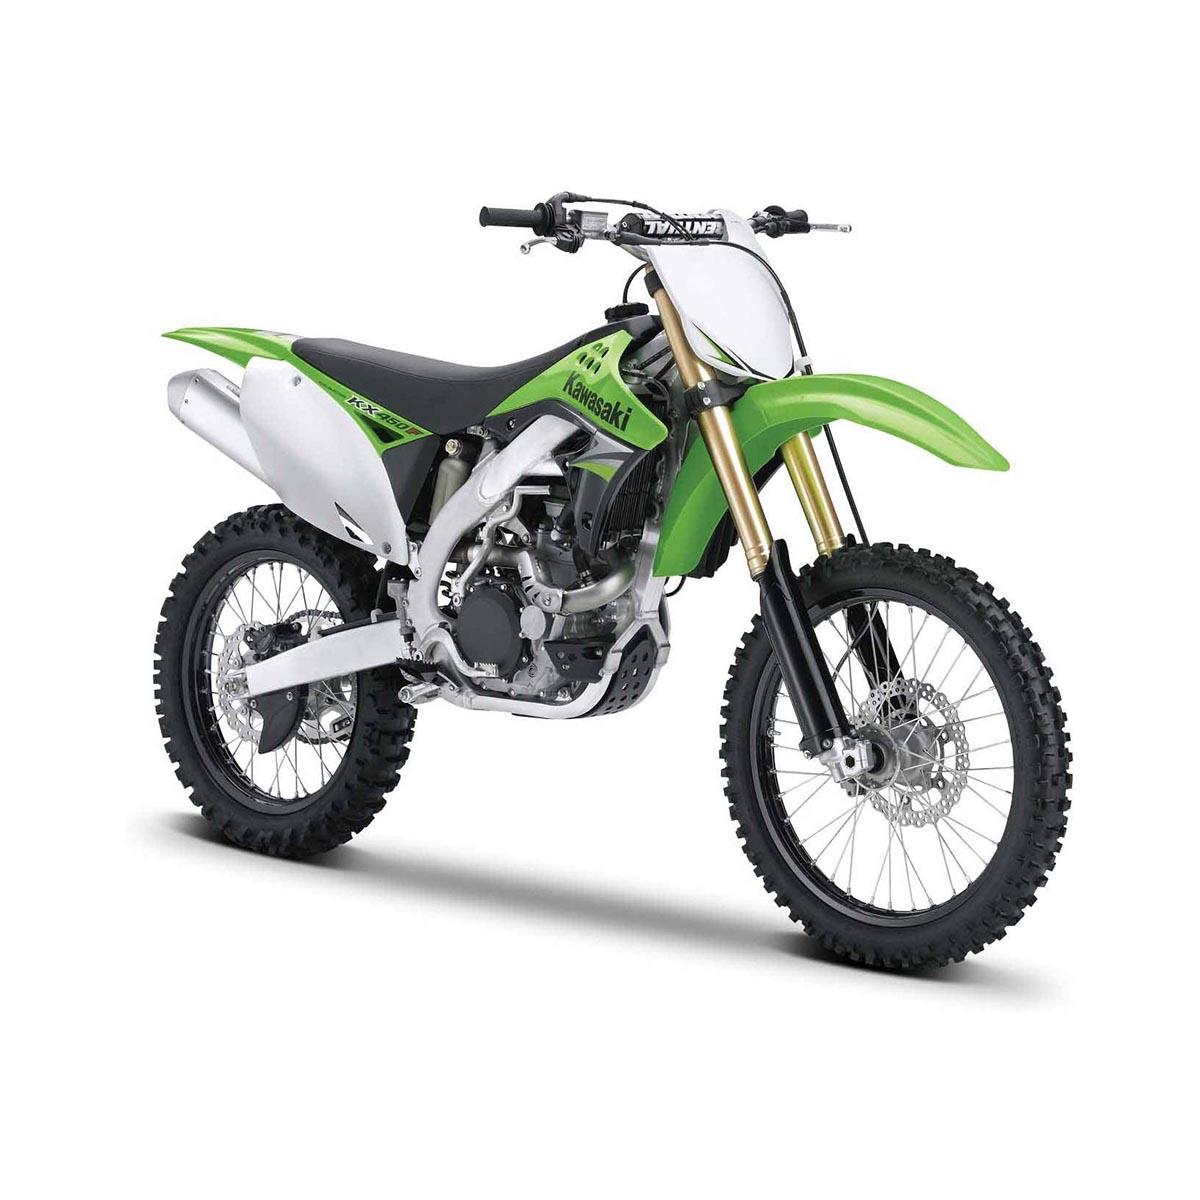 Motocicleta Maisto Kawasaki KX 450F, 1:12